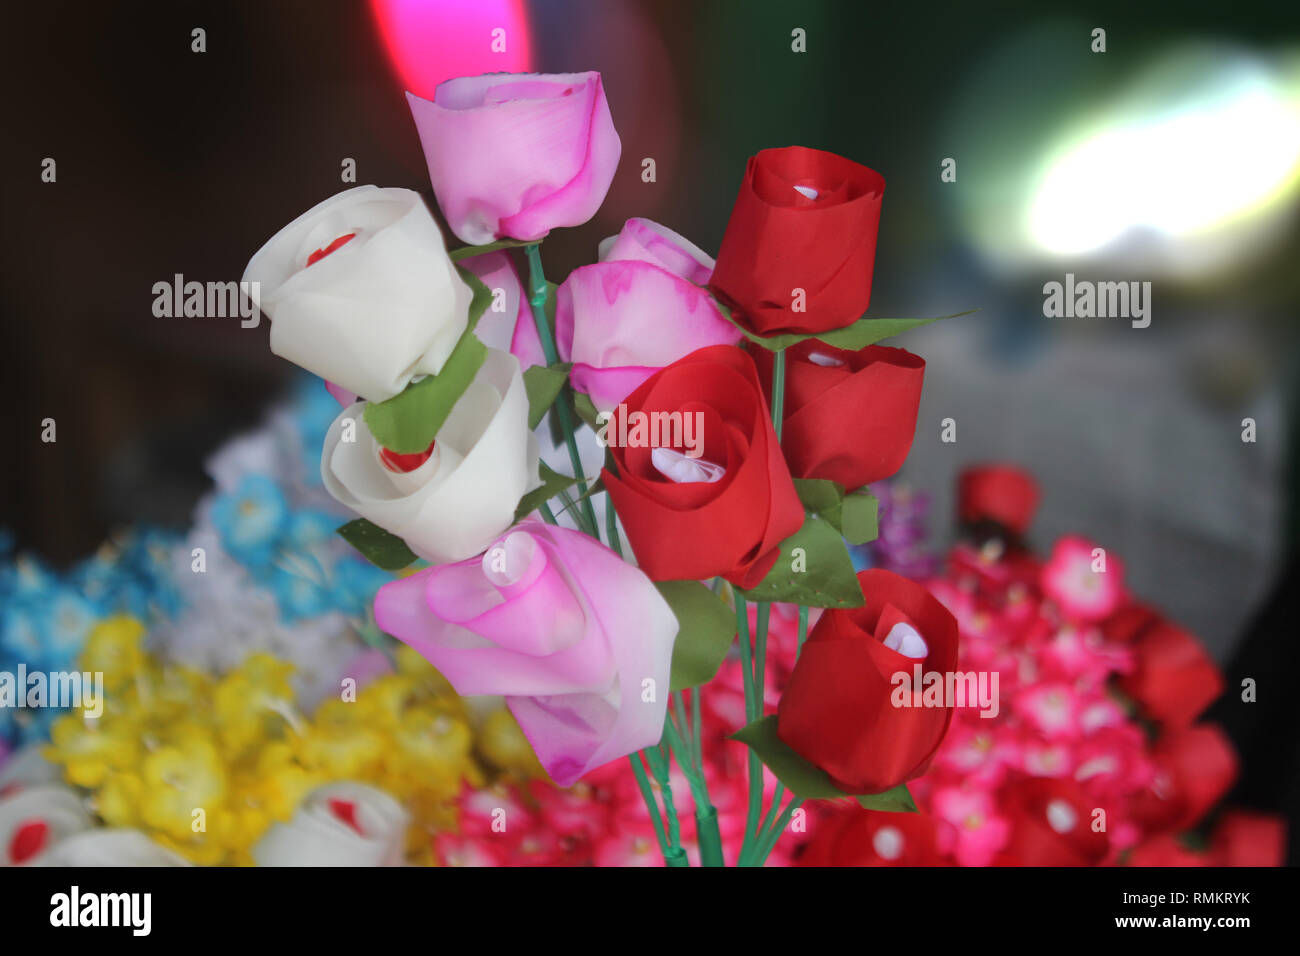 Bast flower - Stock Image